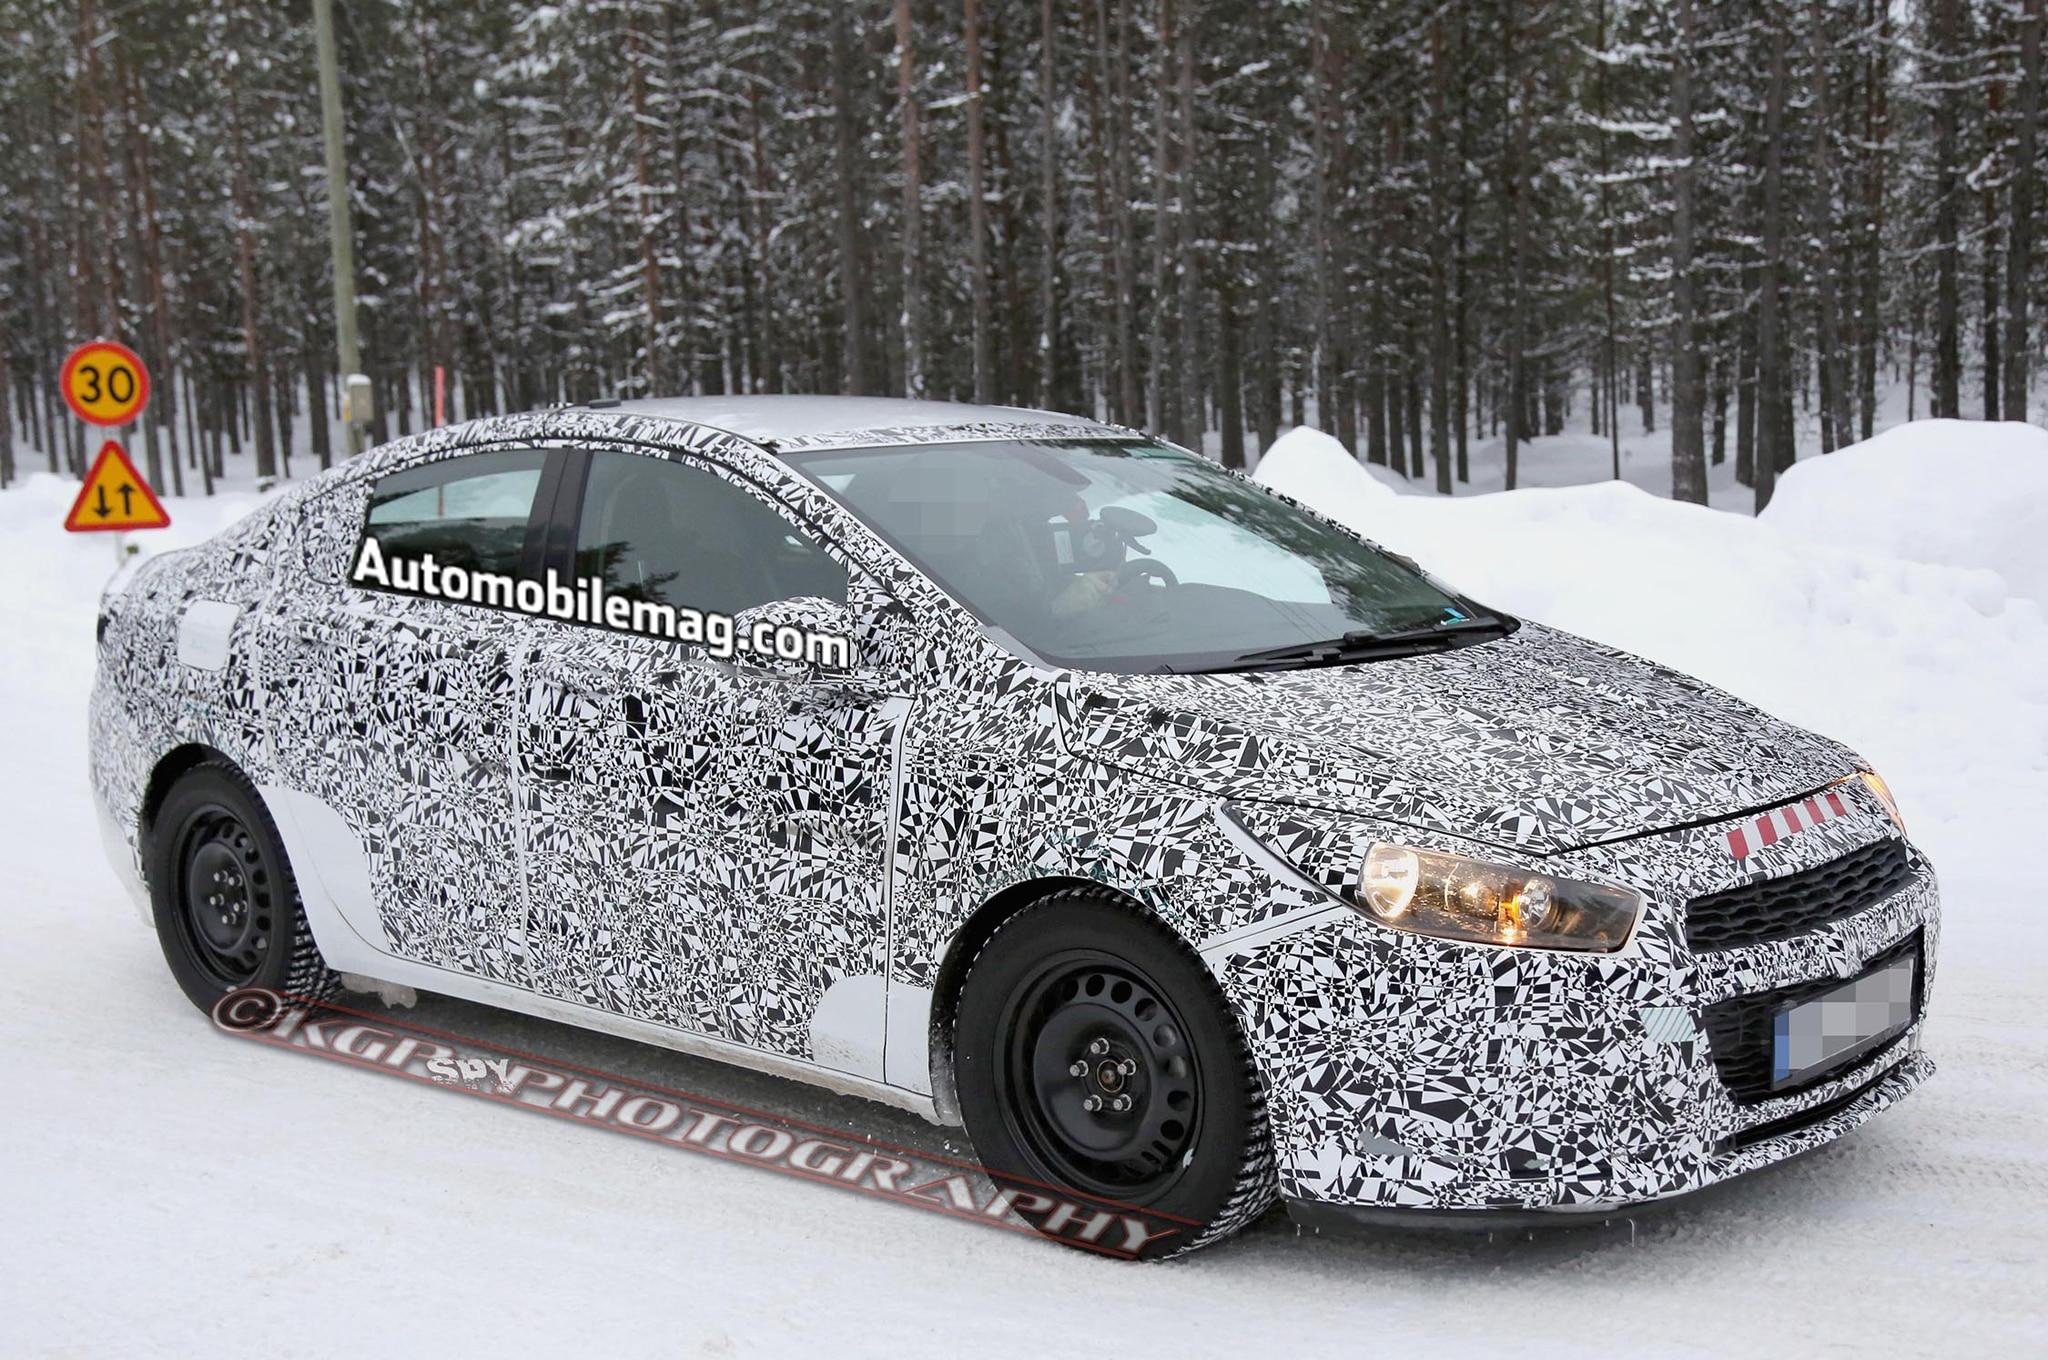 2016 Chevrolet Cruze Spied Front Three Quarter 51